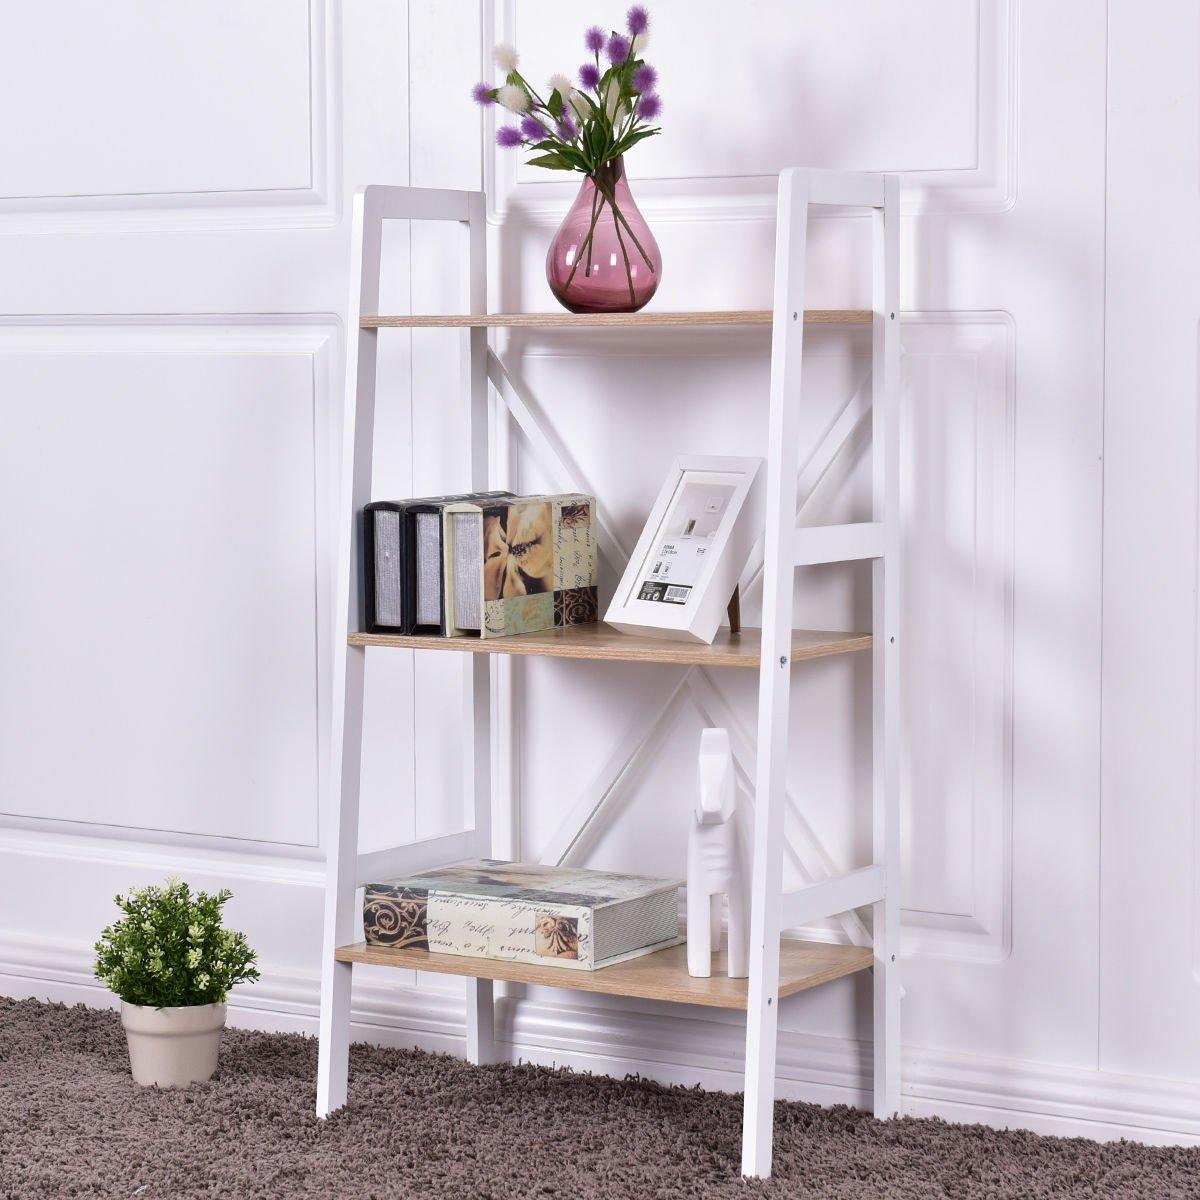 Giantex 3 Tier Bookshelf Bookcase Ladder Wall Stand Storage Shelves Book Rack